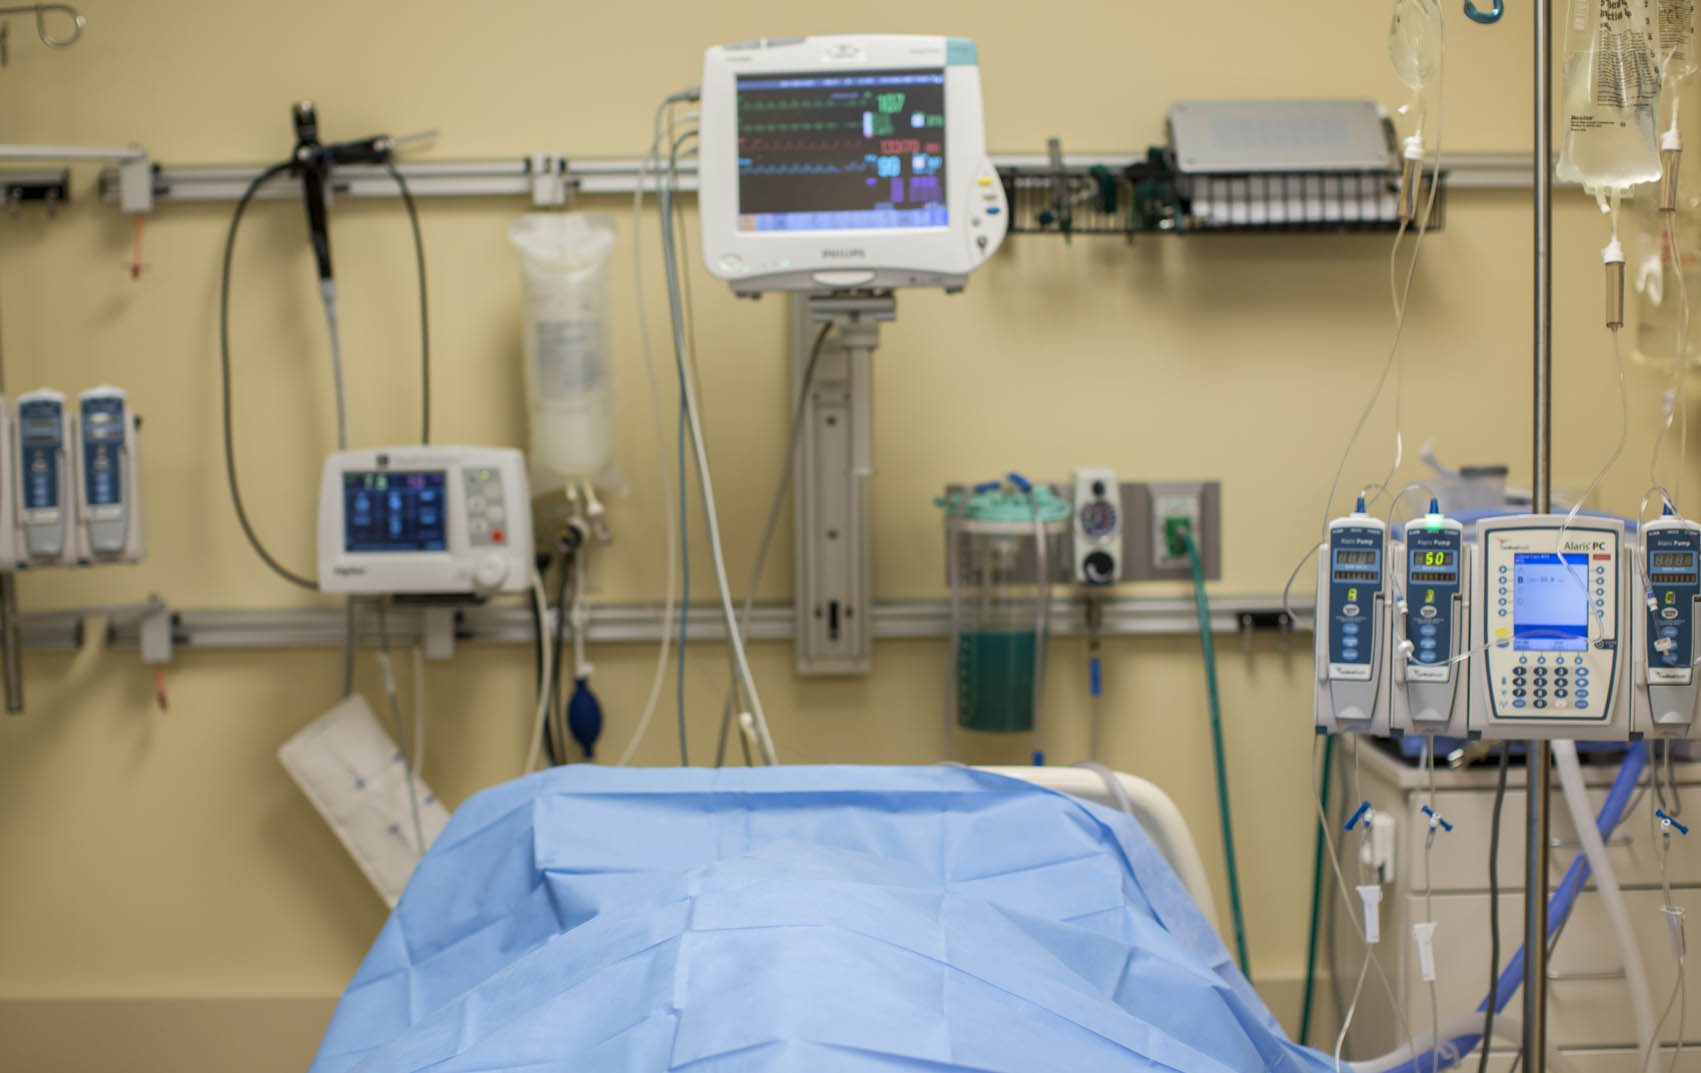 Generic Hospital Room_222157